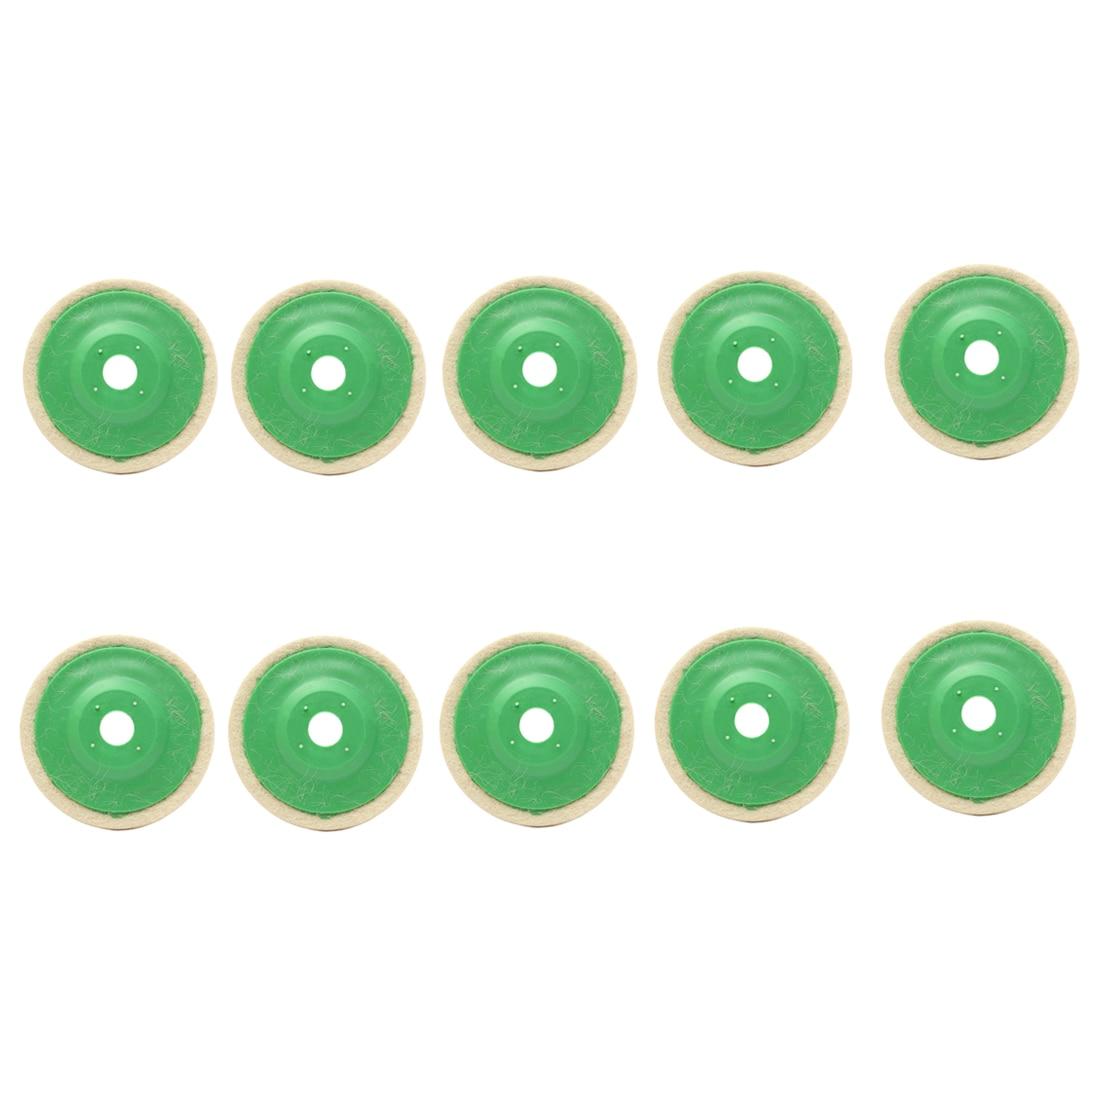 NFLC-10pcs 100mm 4 Inch Round Wool Buffing Pad Polishing Wheel Felt Buffer Disc Set